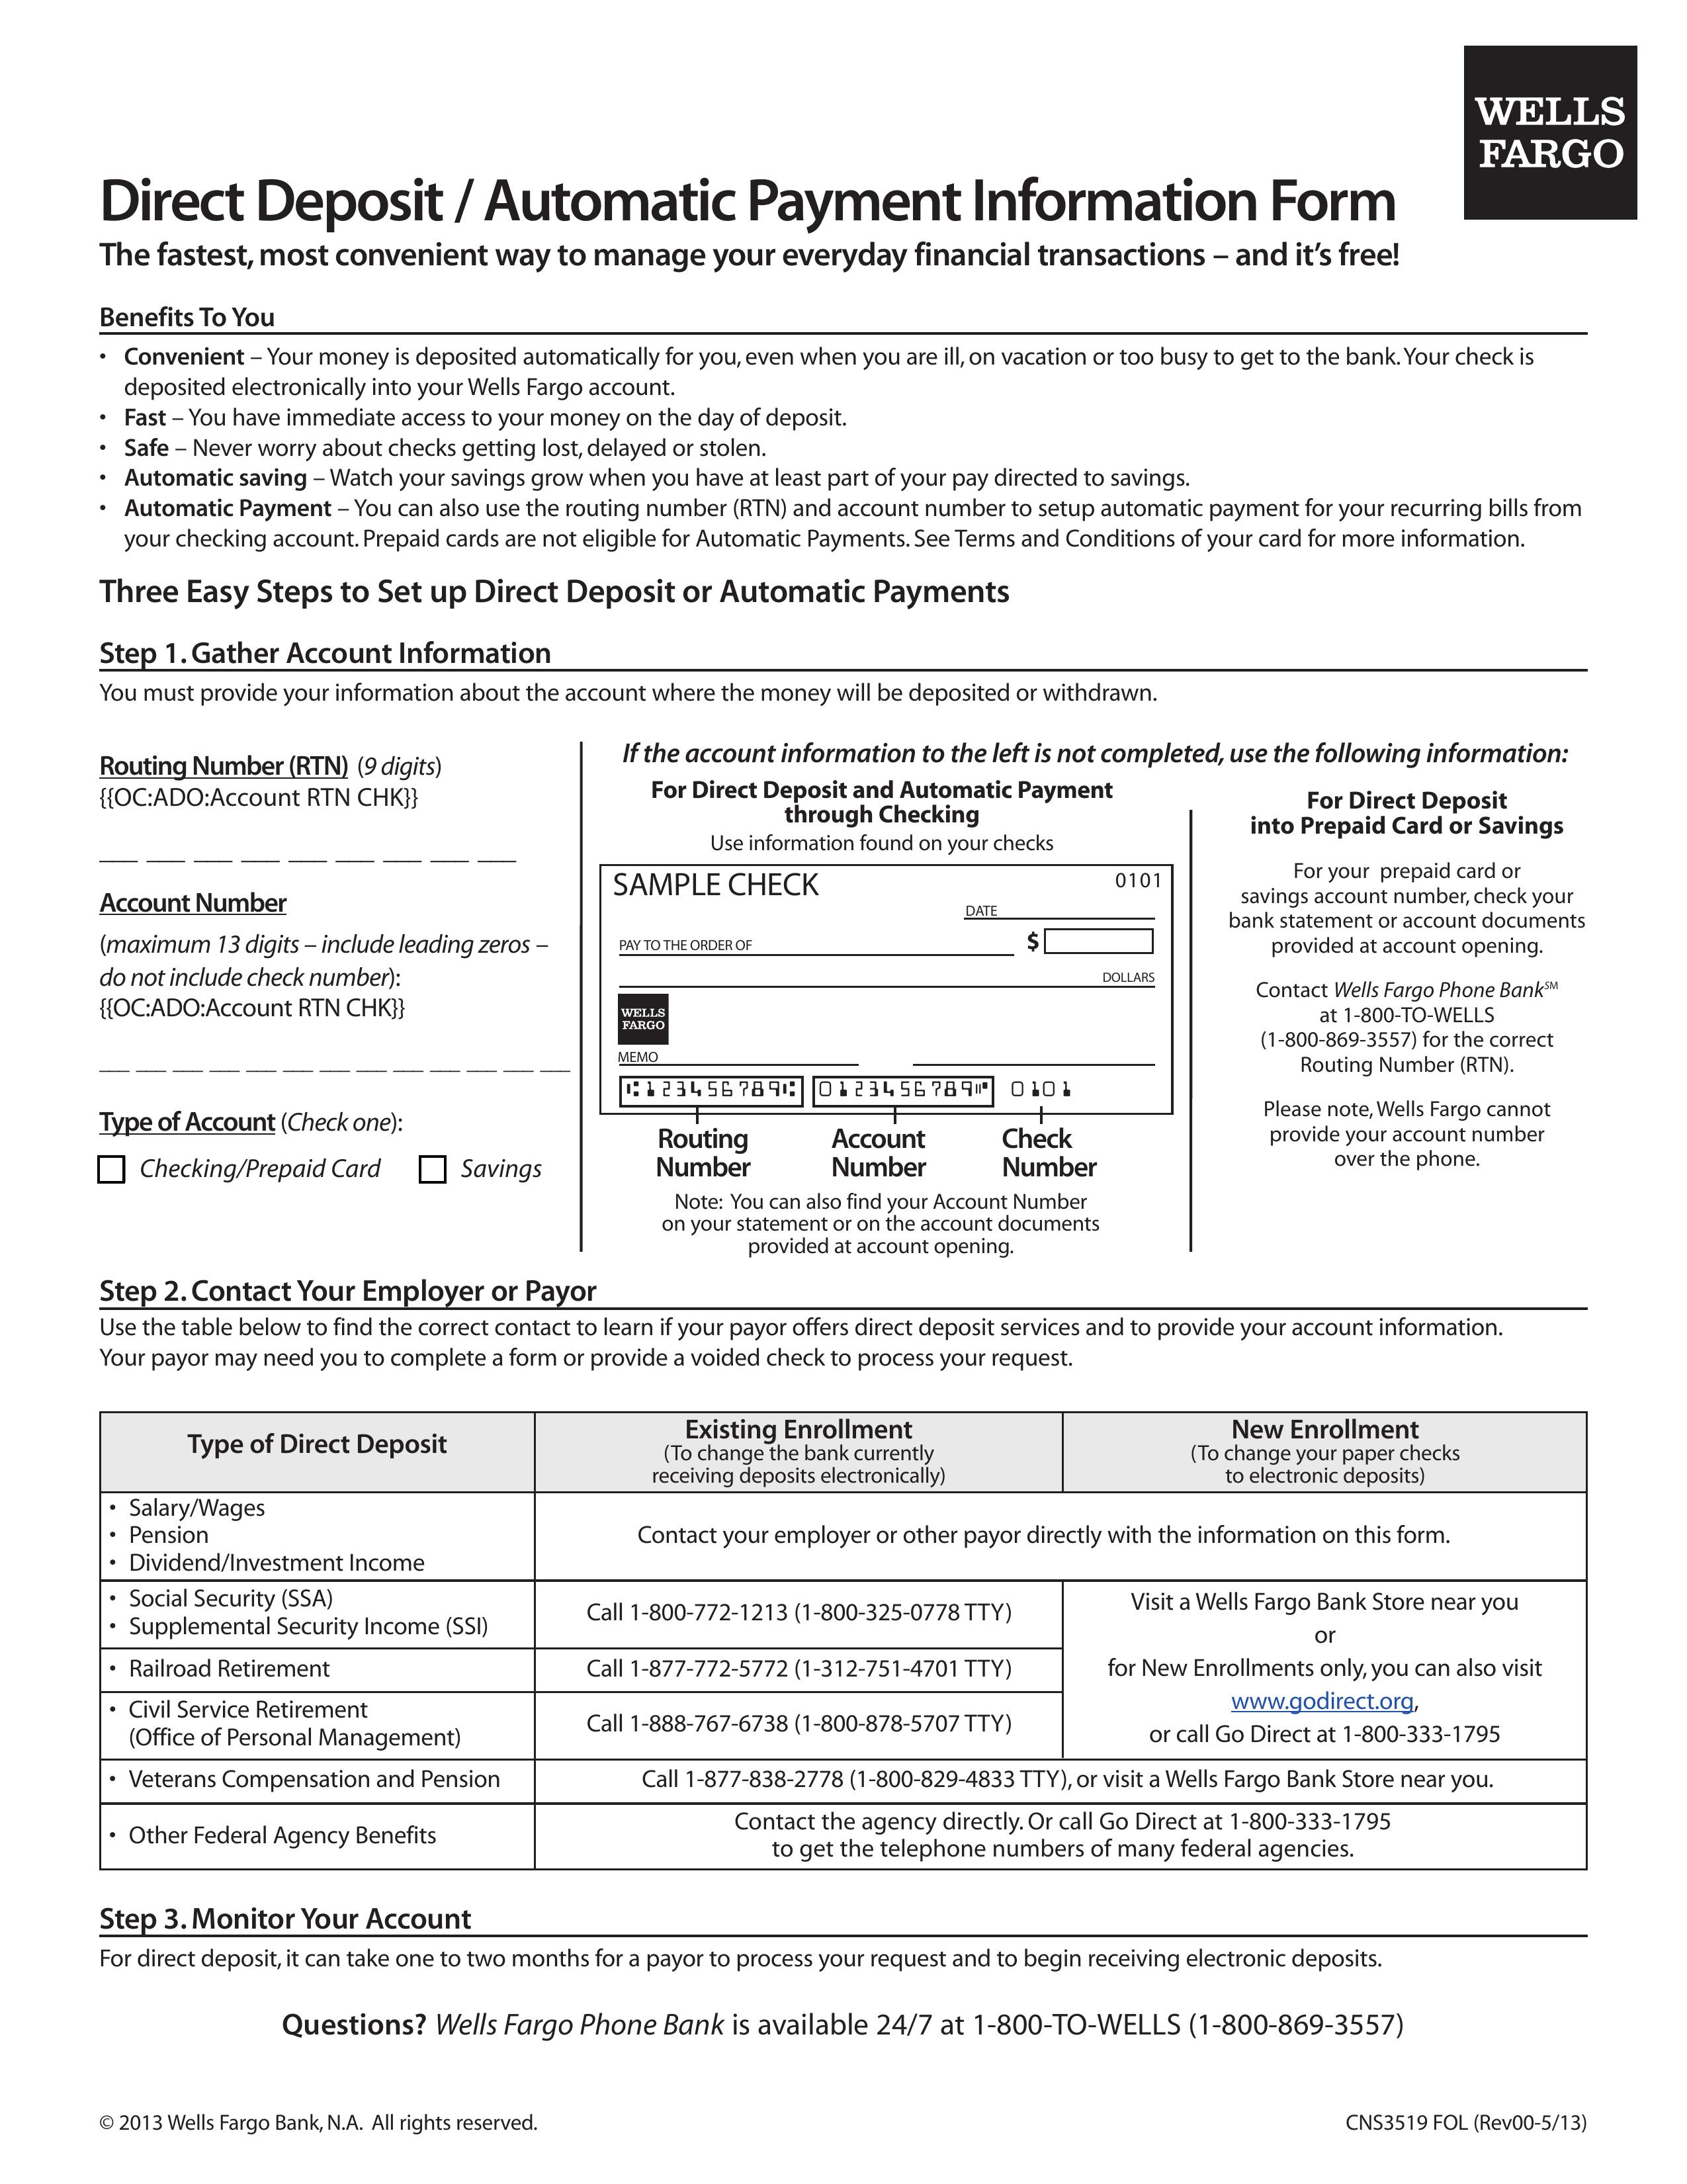 Free Wells Fargo Direct Deposit Form Pdf Eforms Free